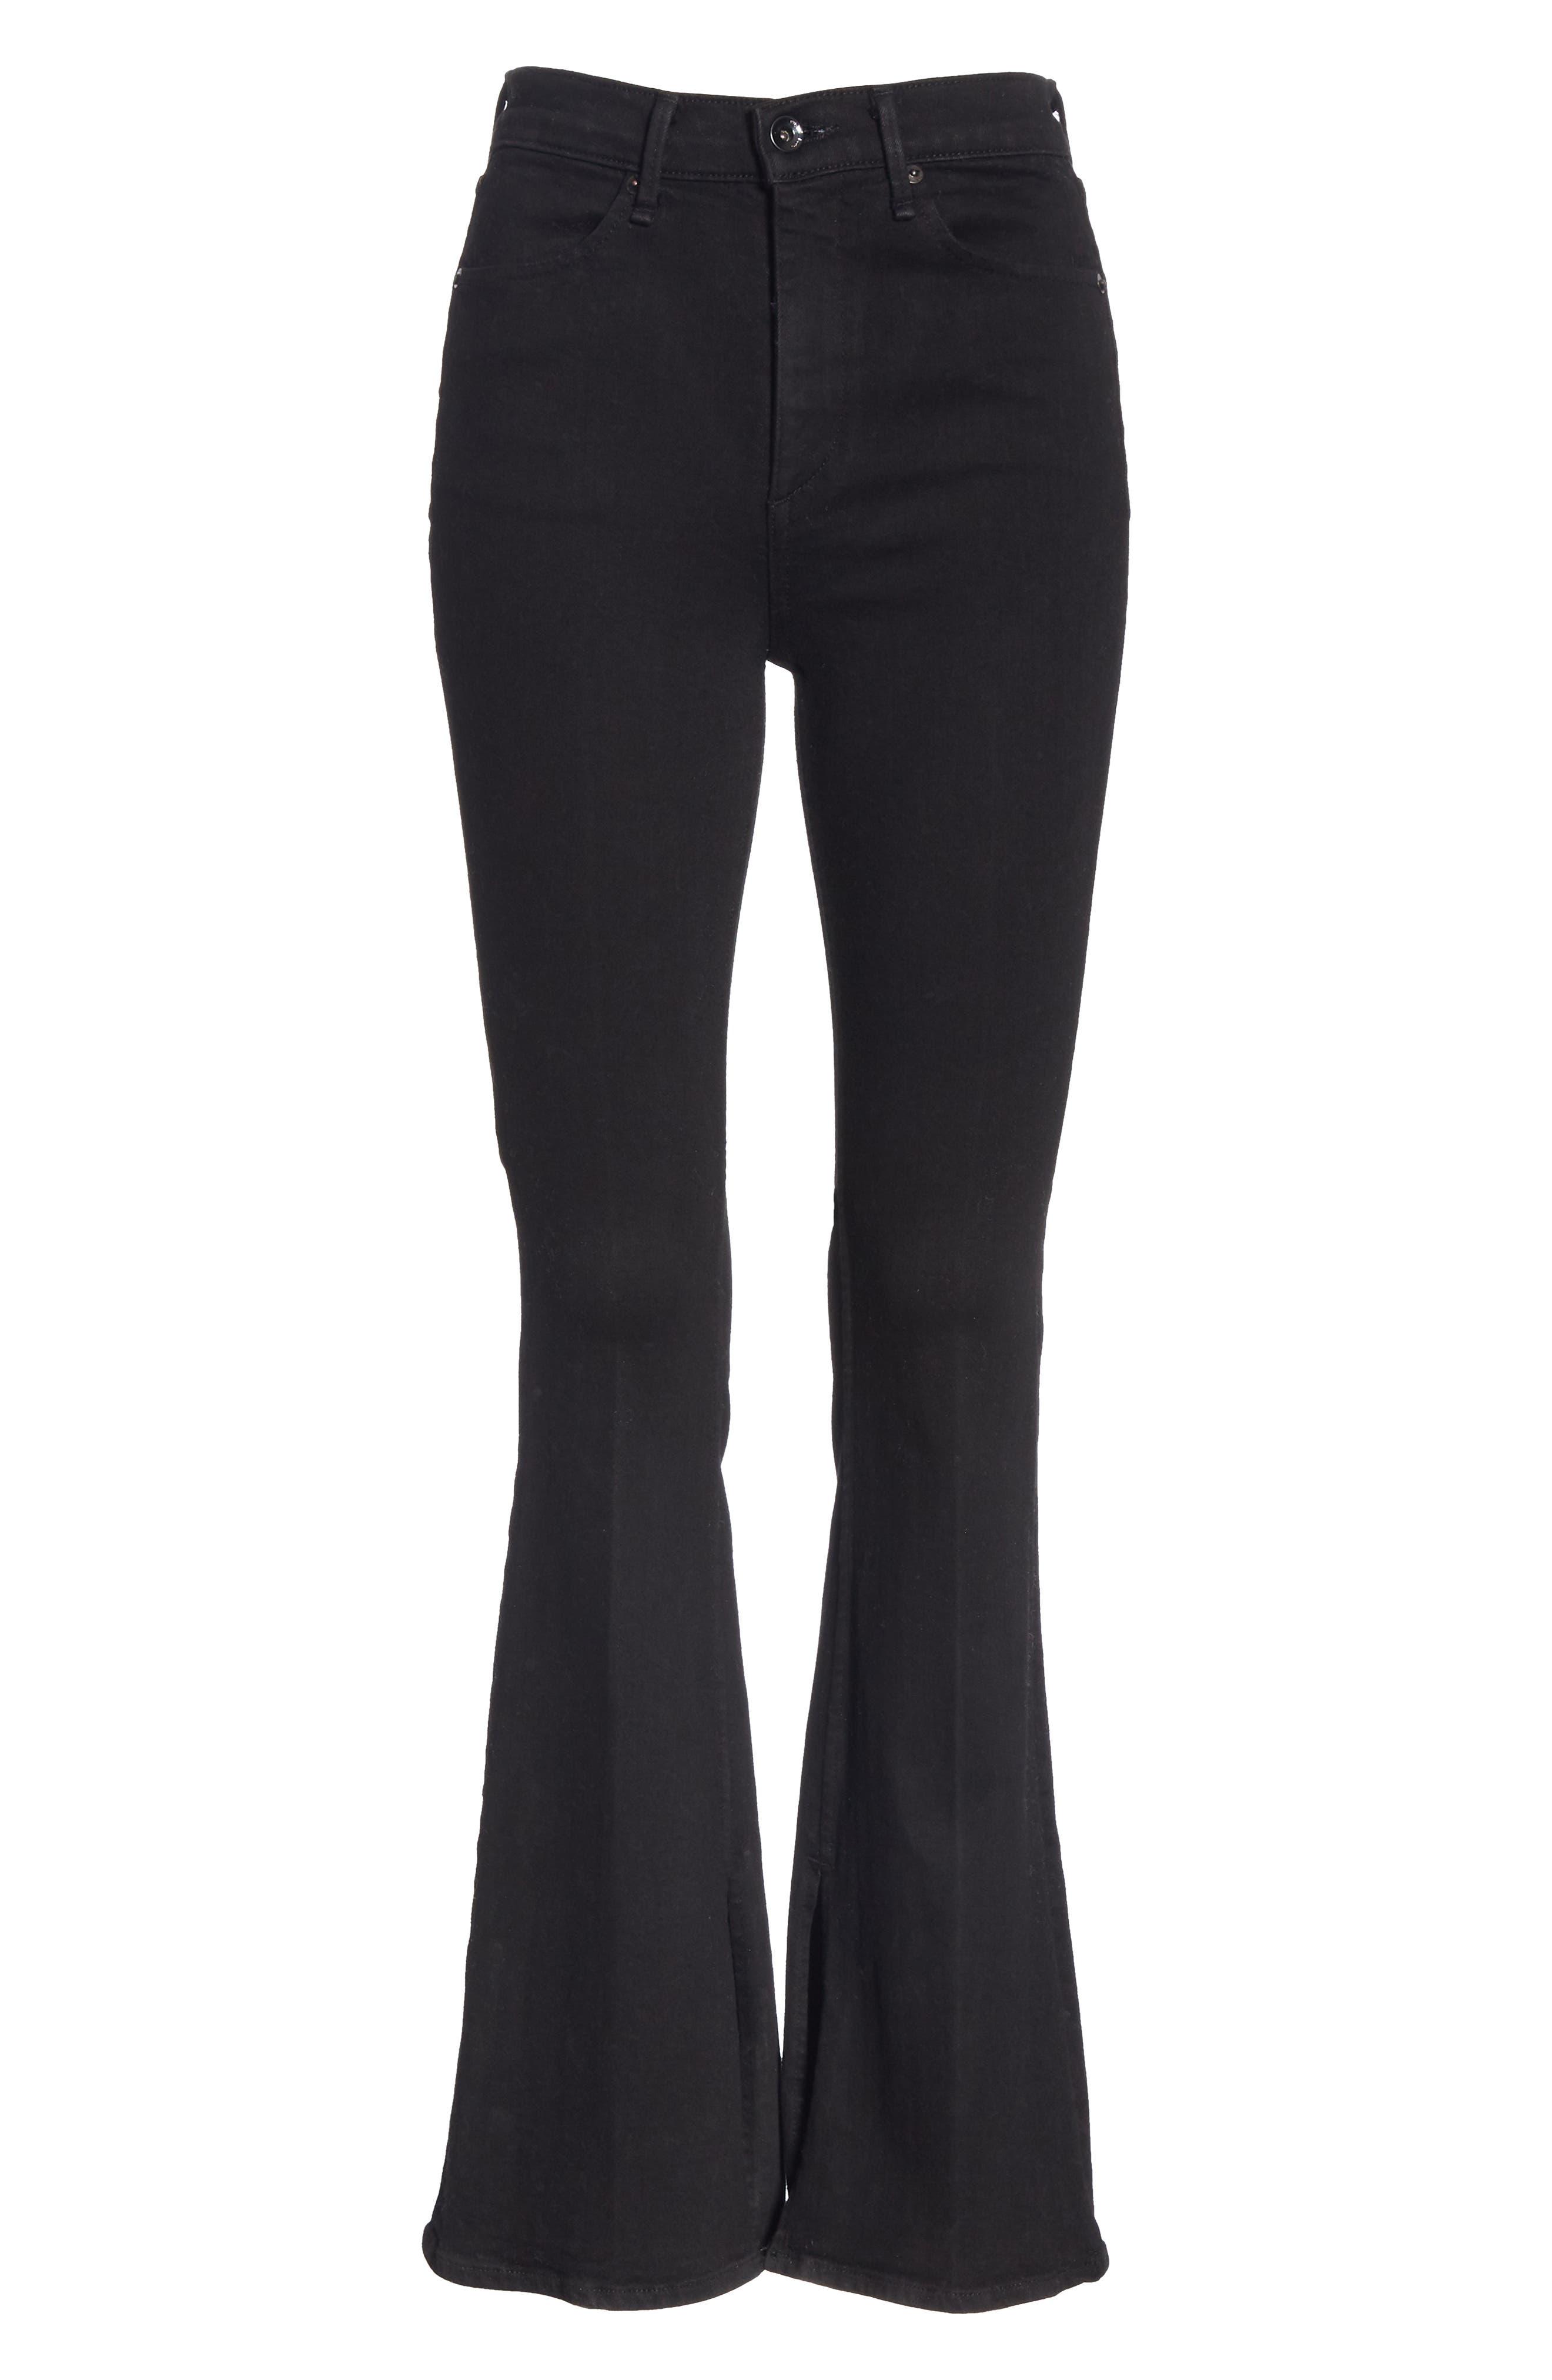 Bella Flare Jeans,                             Alternate thumbnail 6, color,                             BLACK